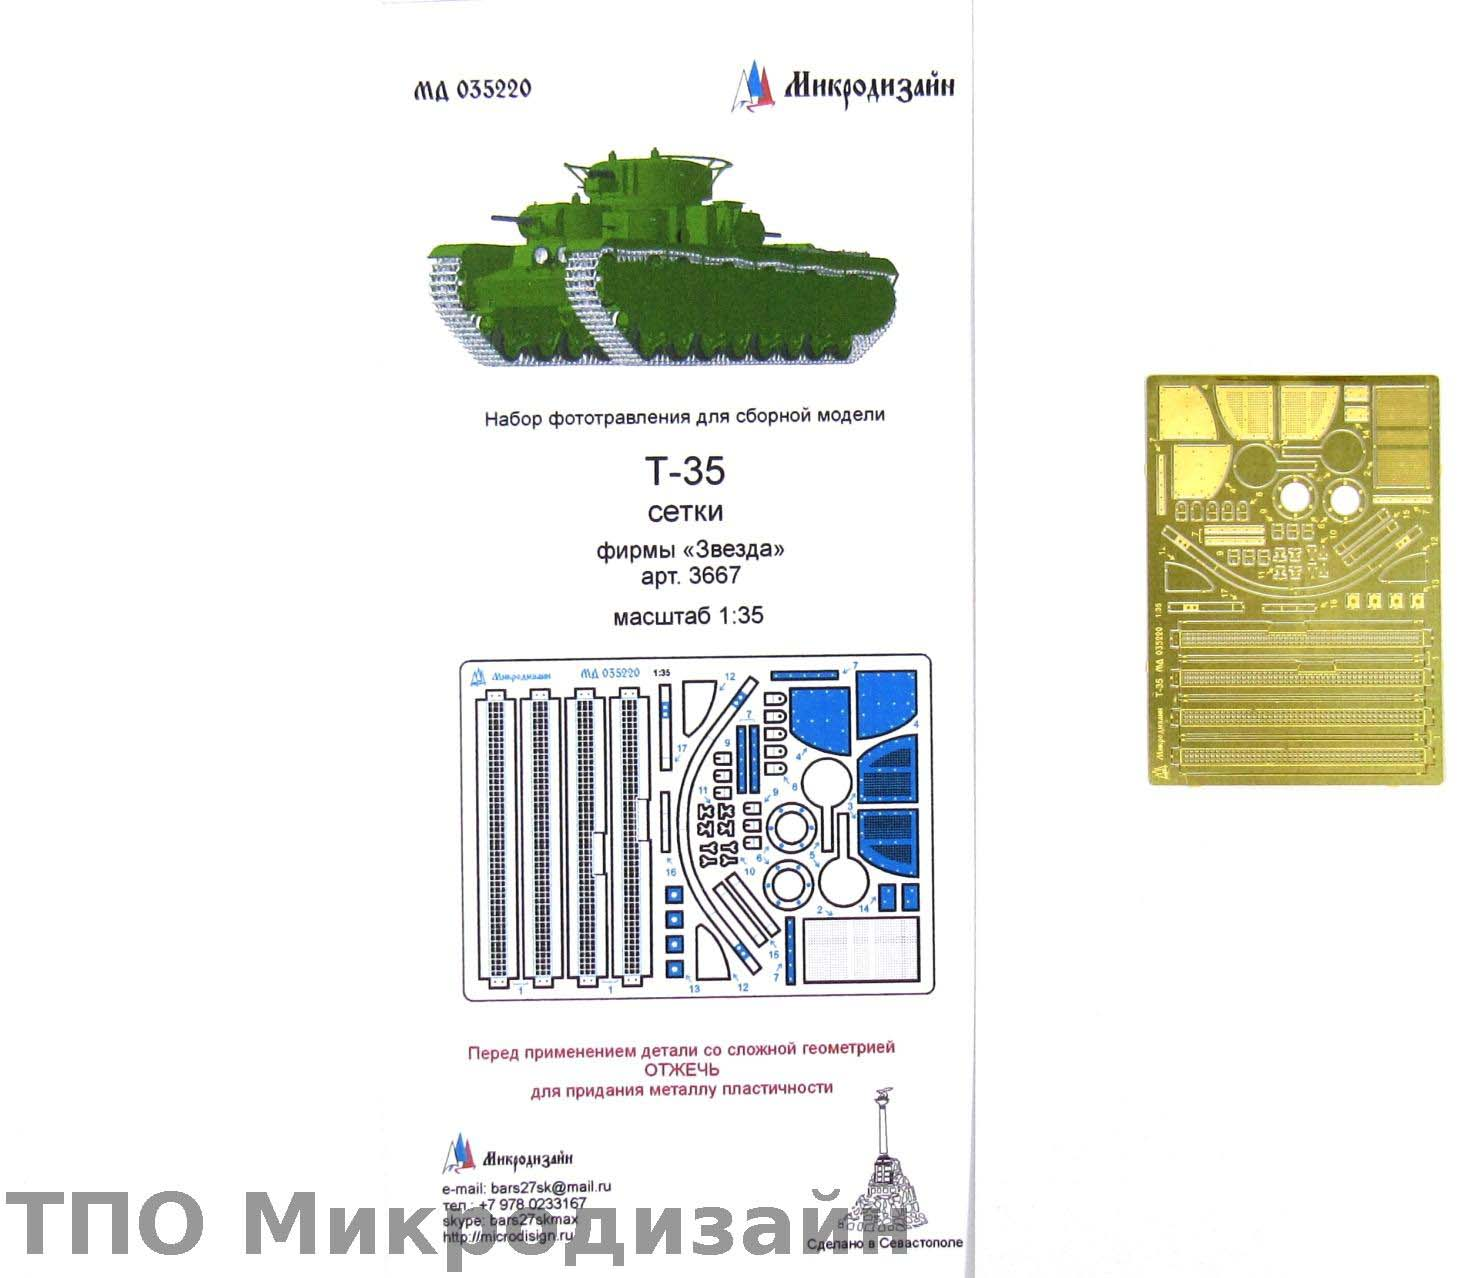 MD 035220 Mesh T-35 Image